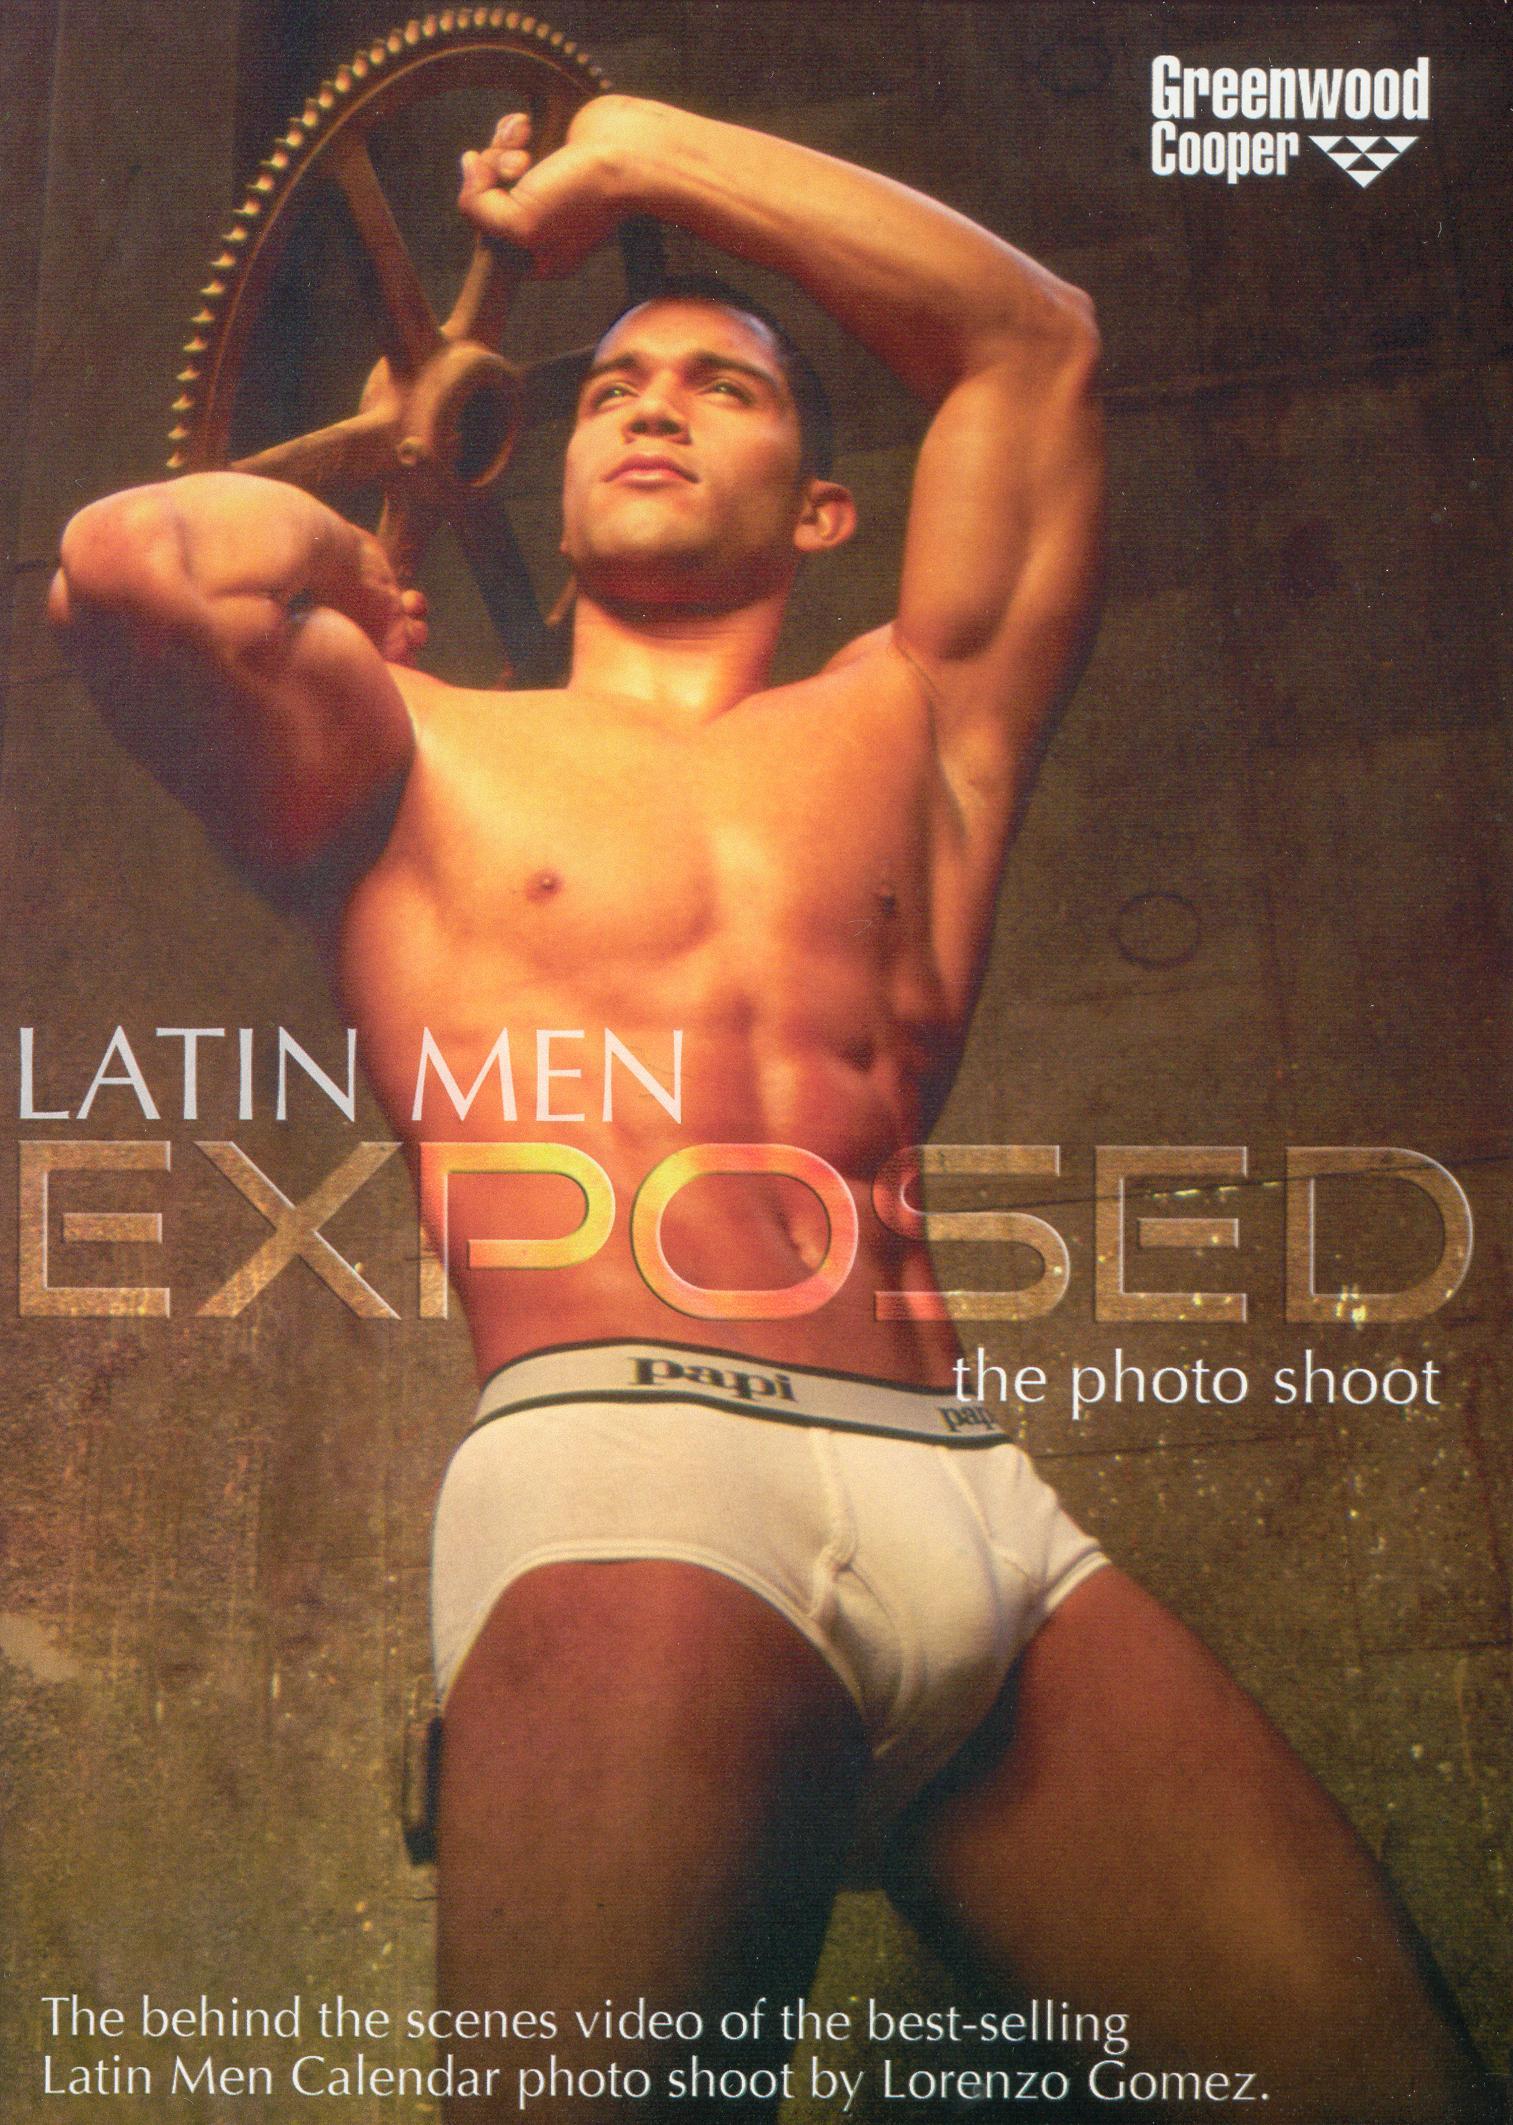 Latin Men Exposed